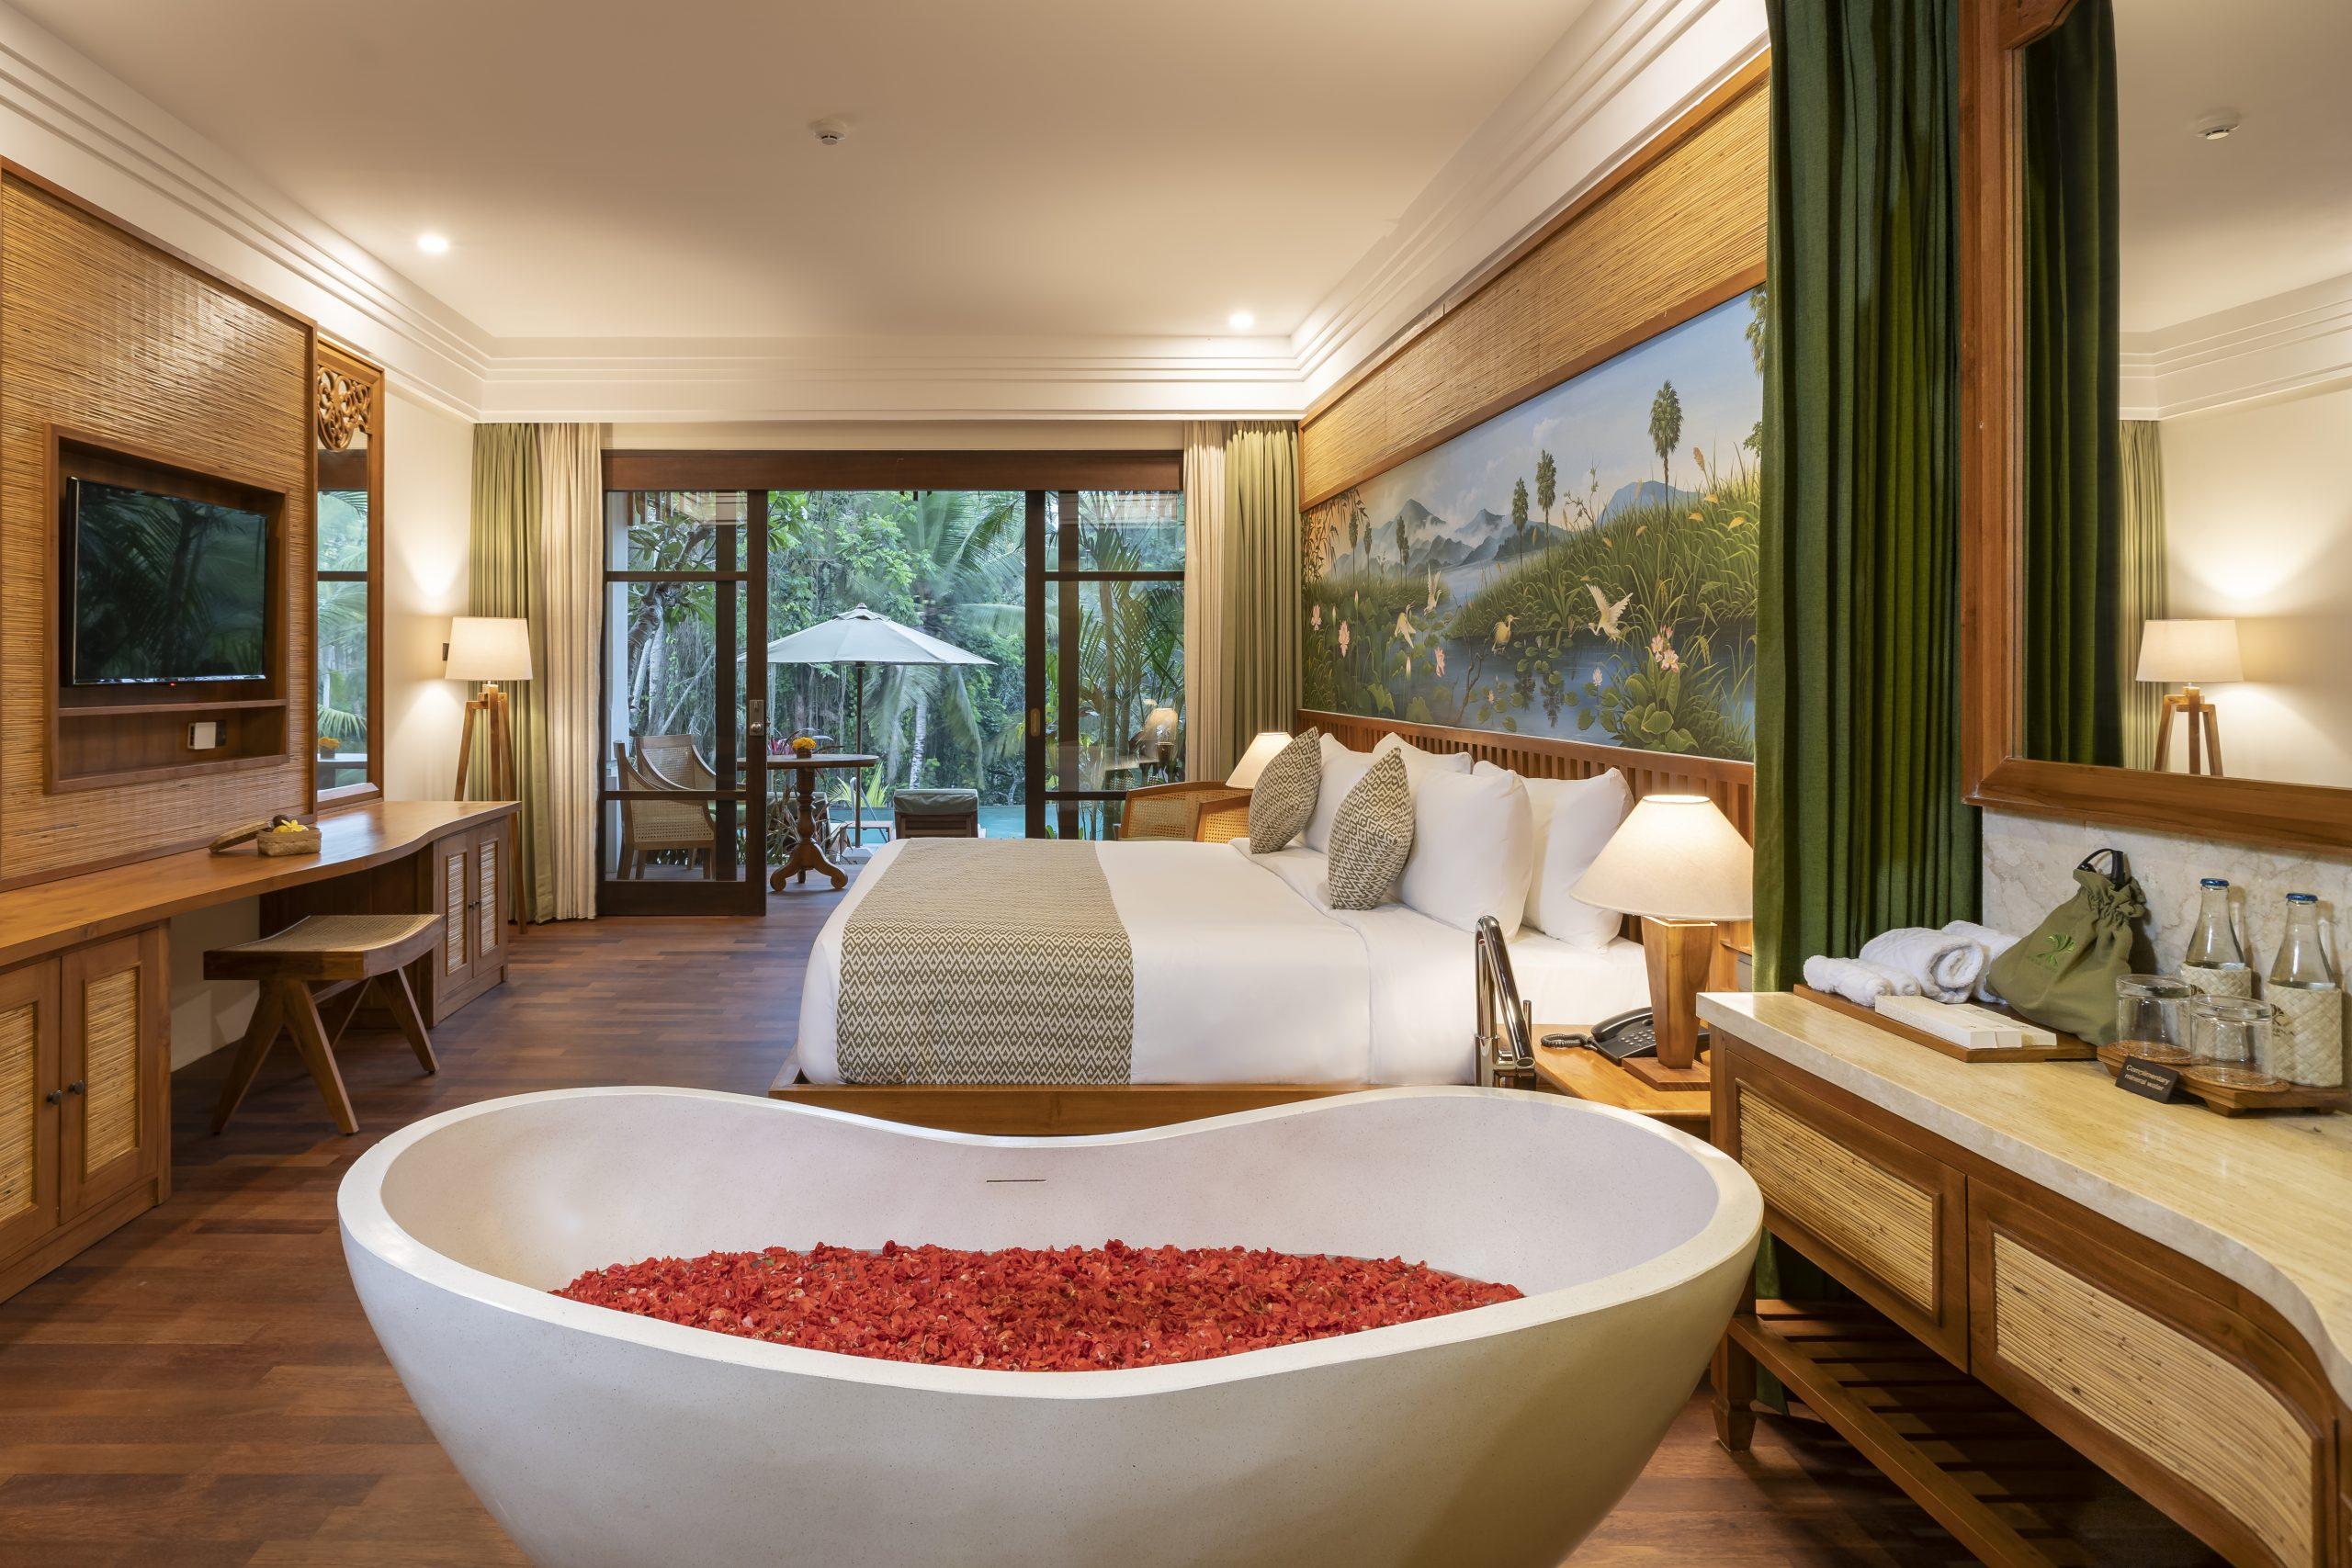 https://highend-traveller.com/adiwana-hotels-resorts-announces-the-opening-of-its-latest-resort-collection-ubud-adiwana-unagi-suites-on-25th-december-2019/